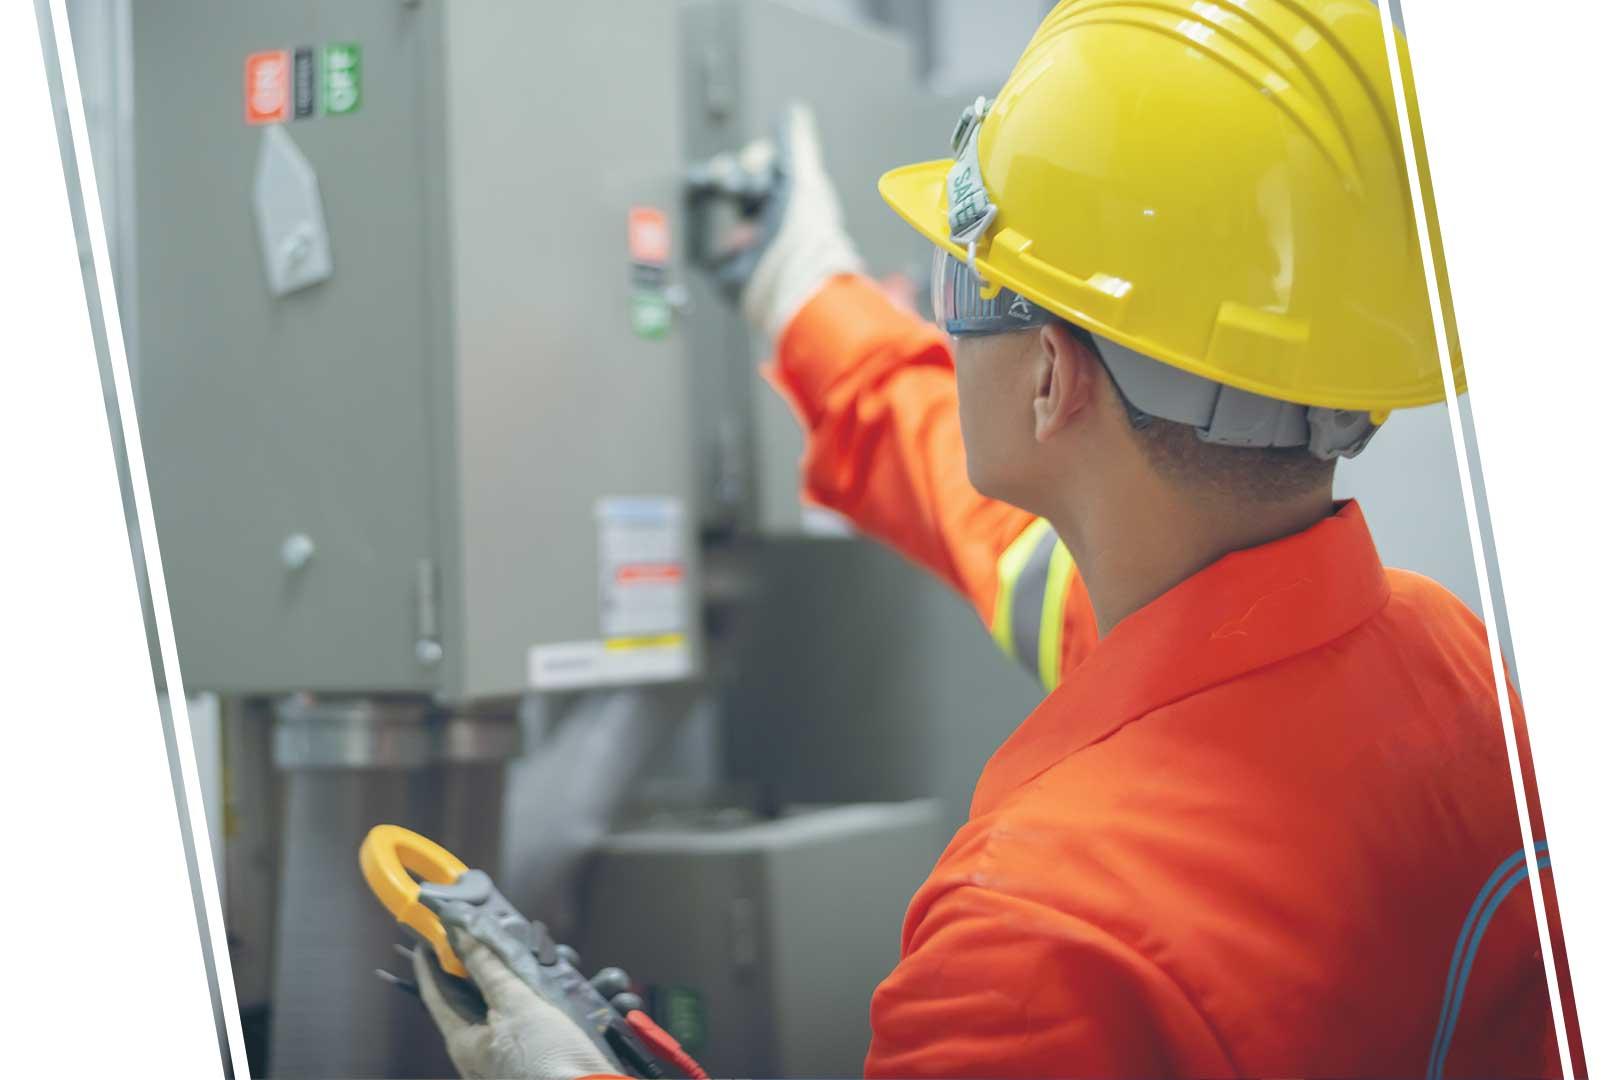 Worker wearing hardhat checking an electrical box